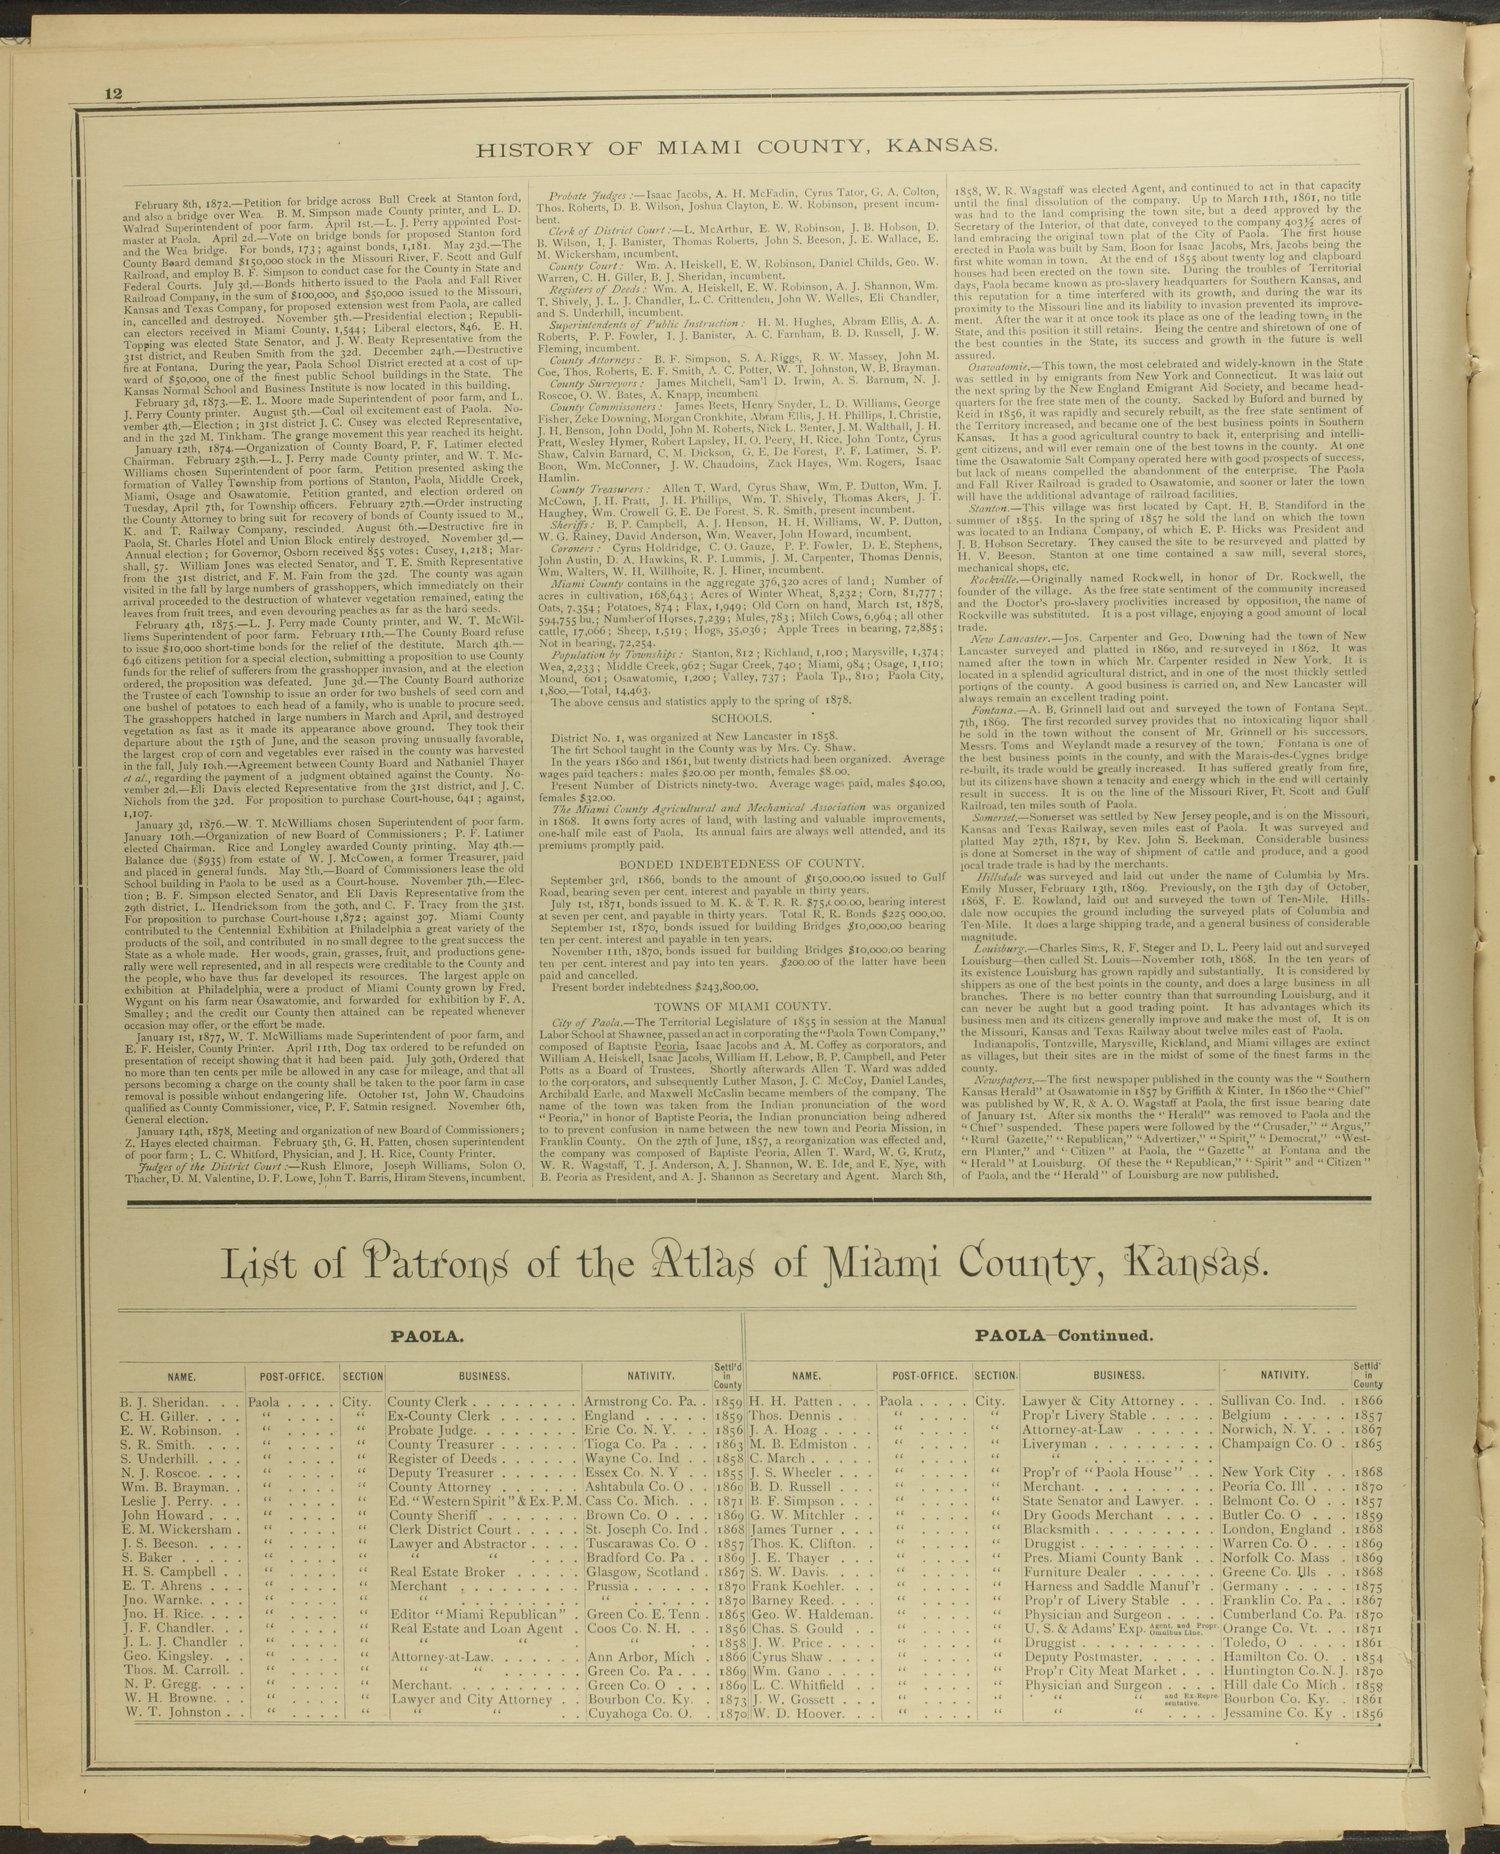 An illustrated historical atlas of Miami County, Kansas - 12